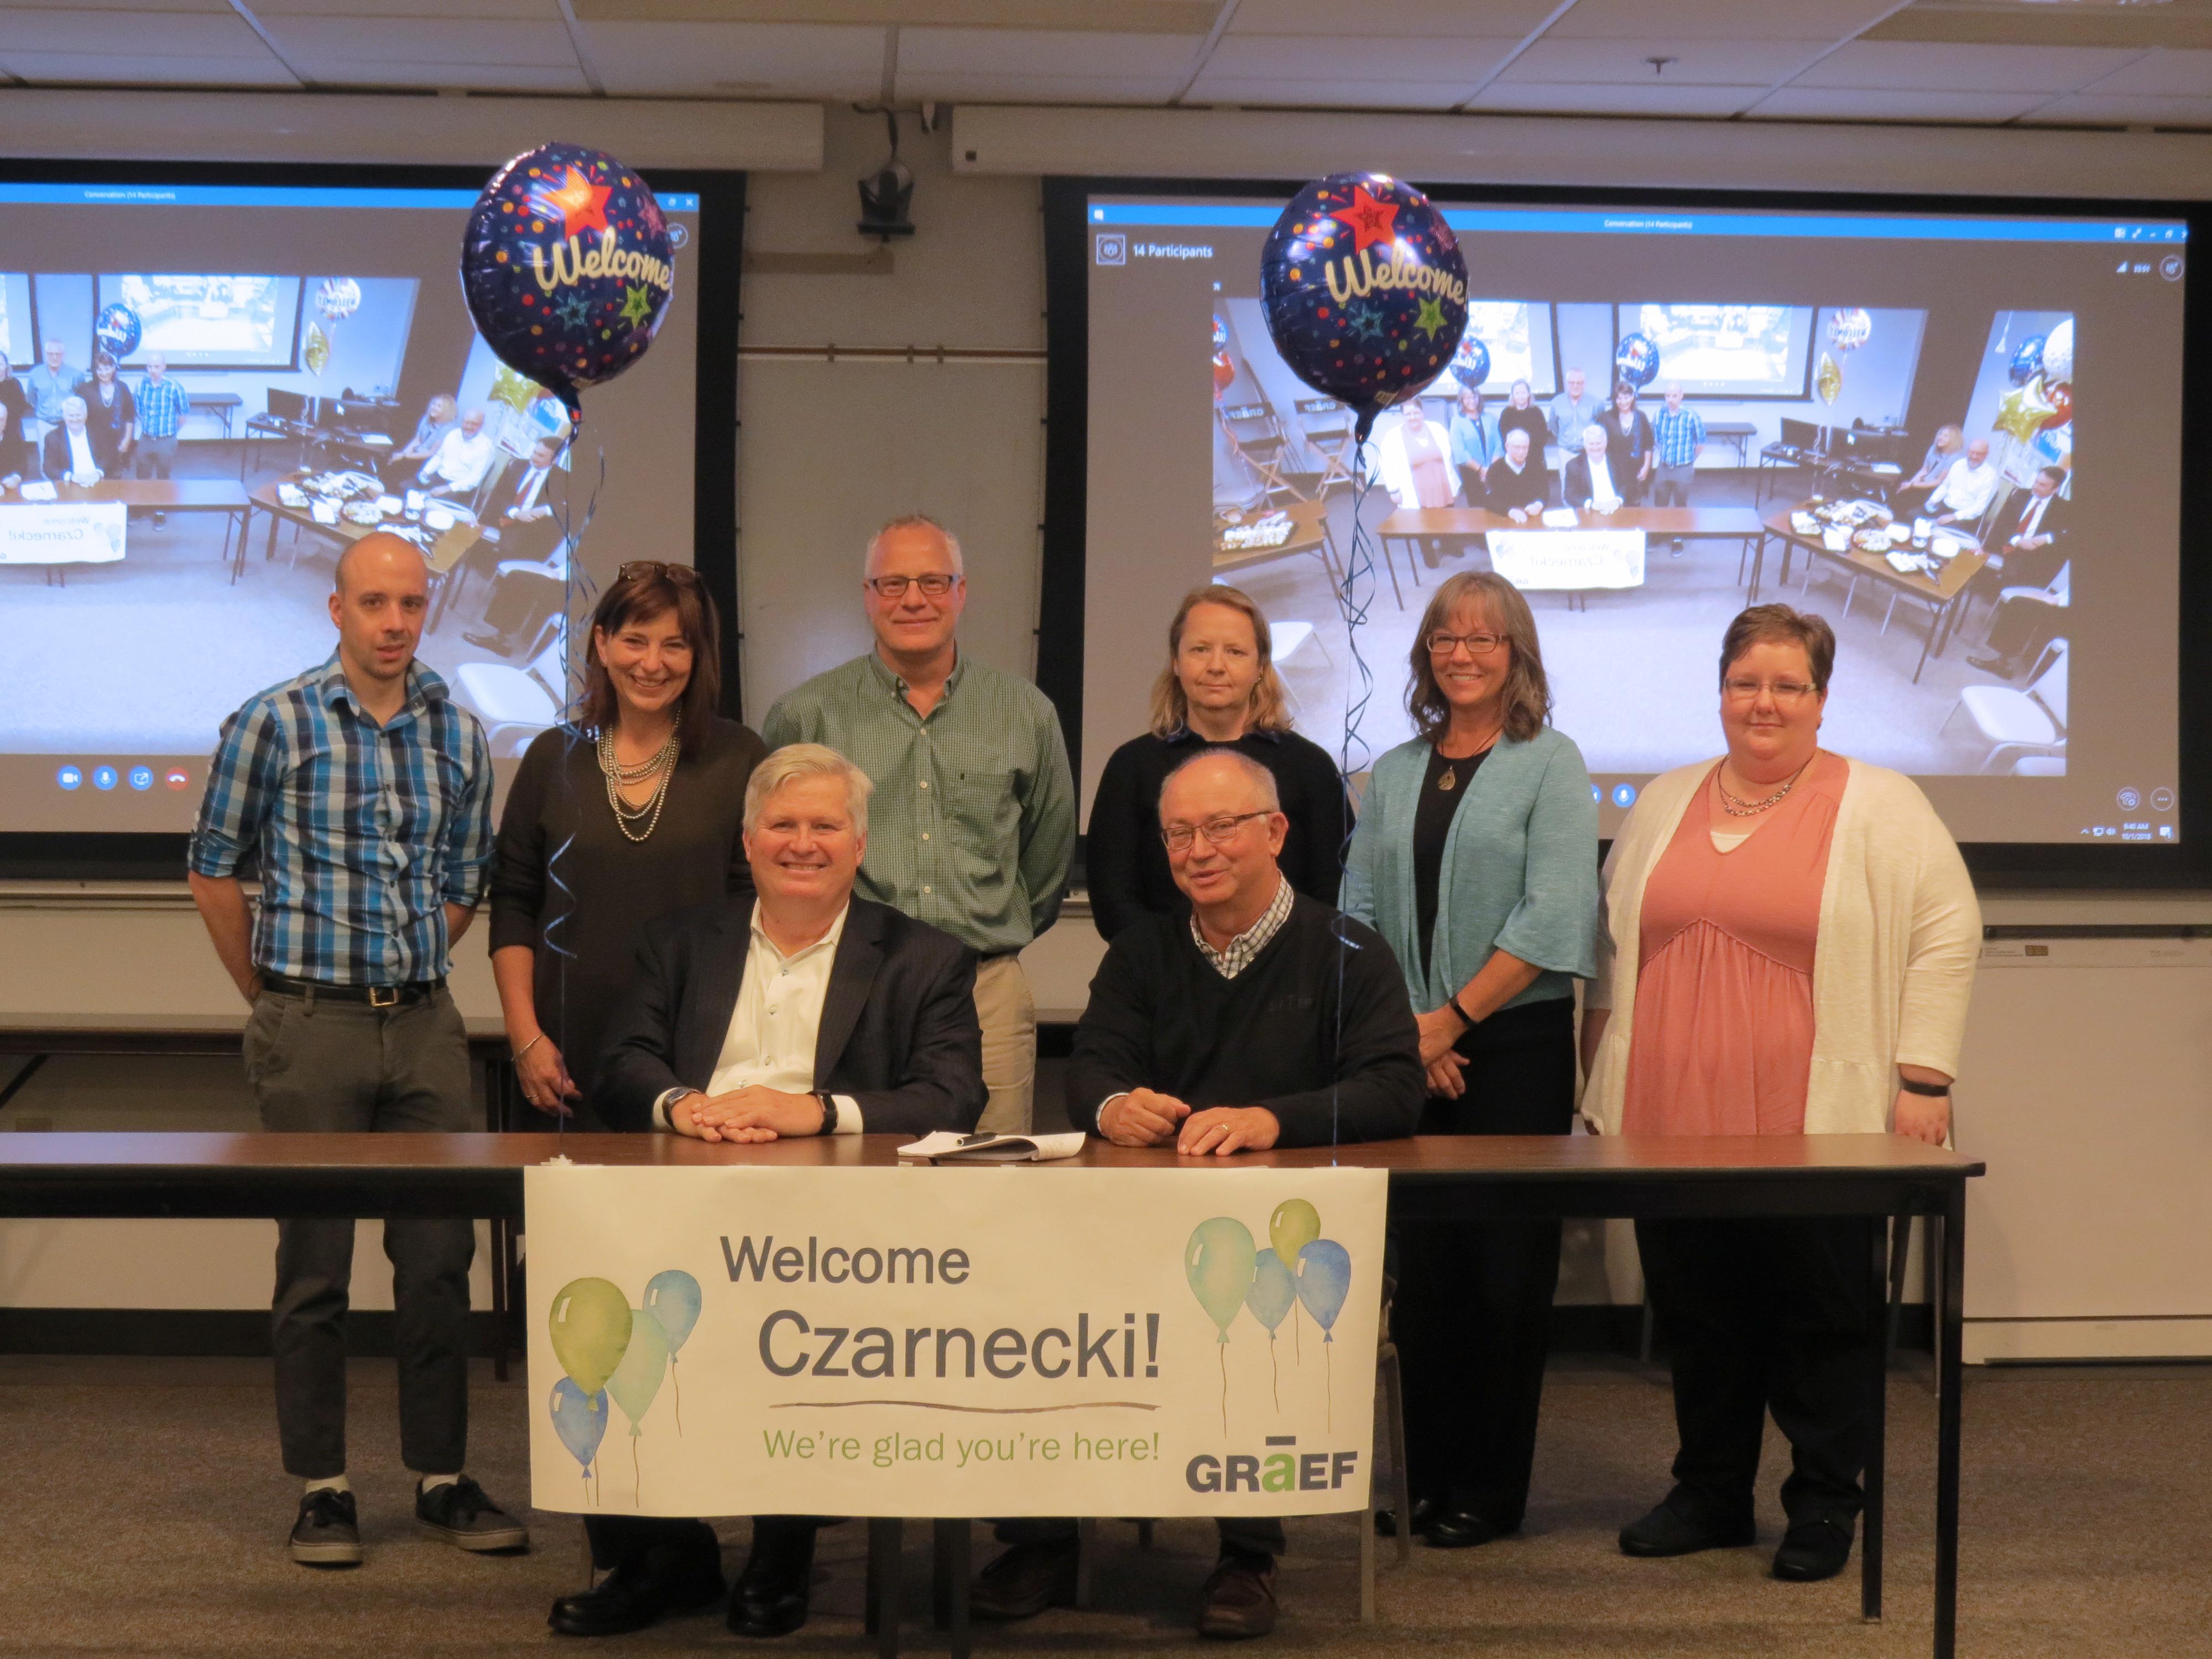 GRAEF Acquires Waukesha-based Czarnecki Engineering, Inc.